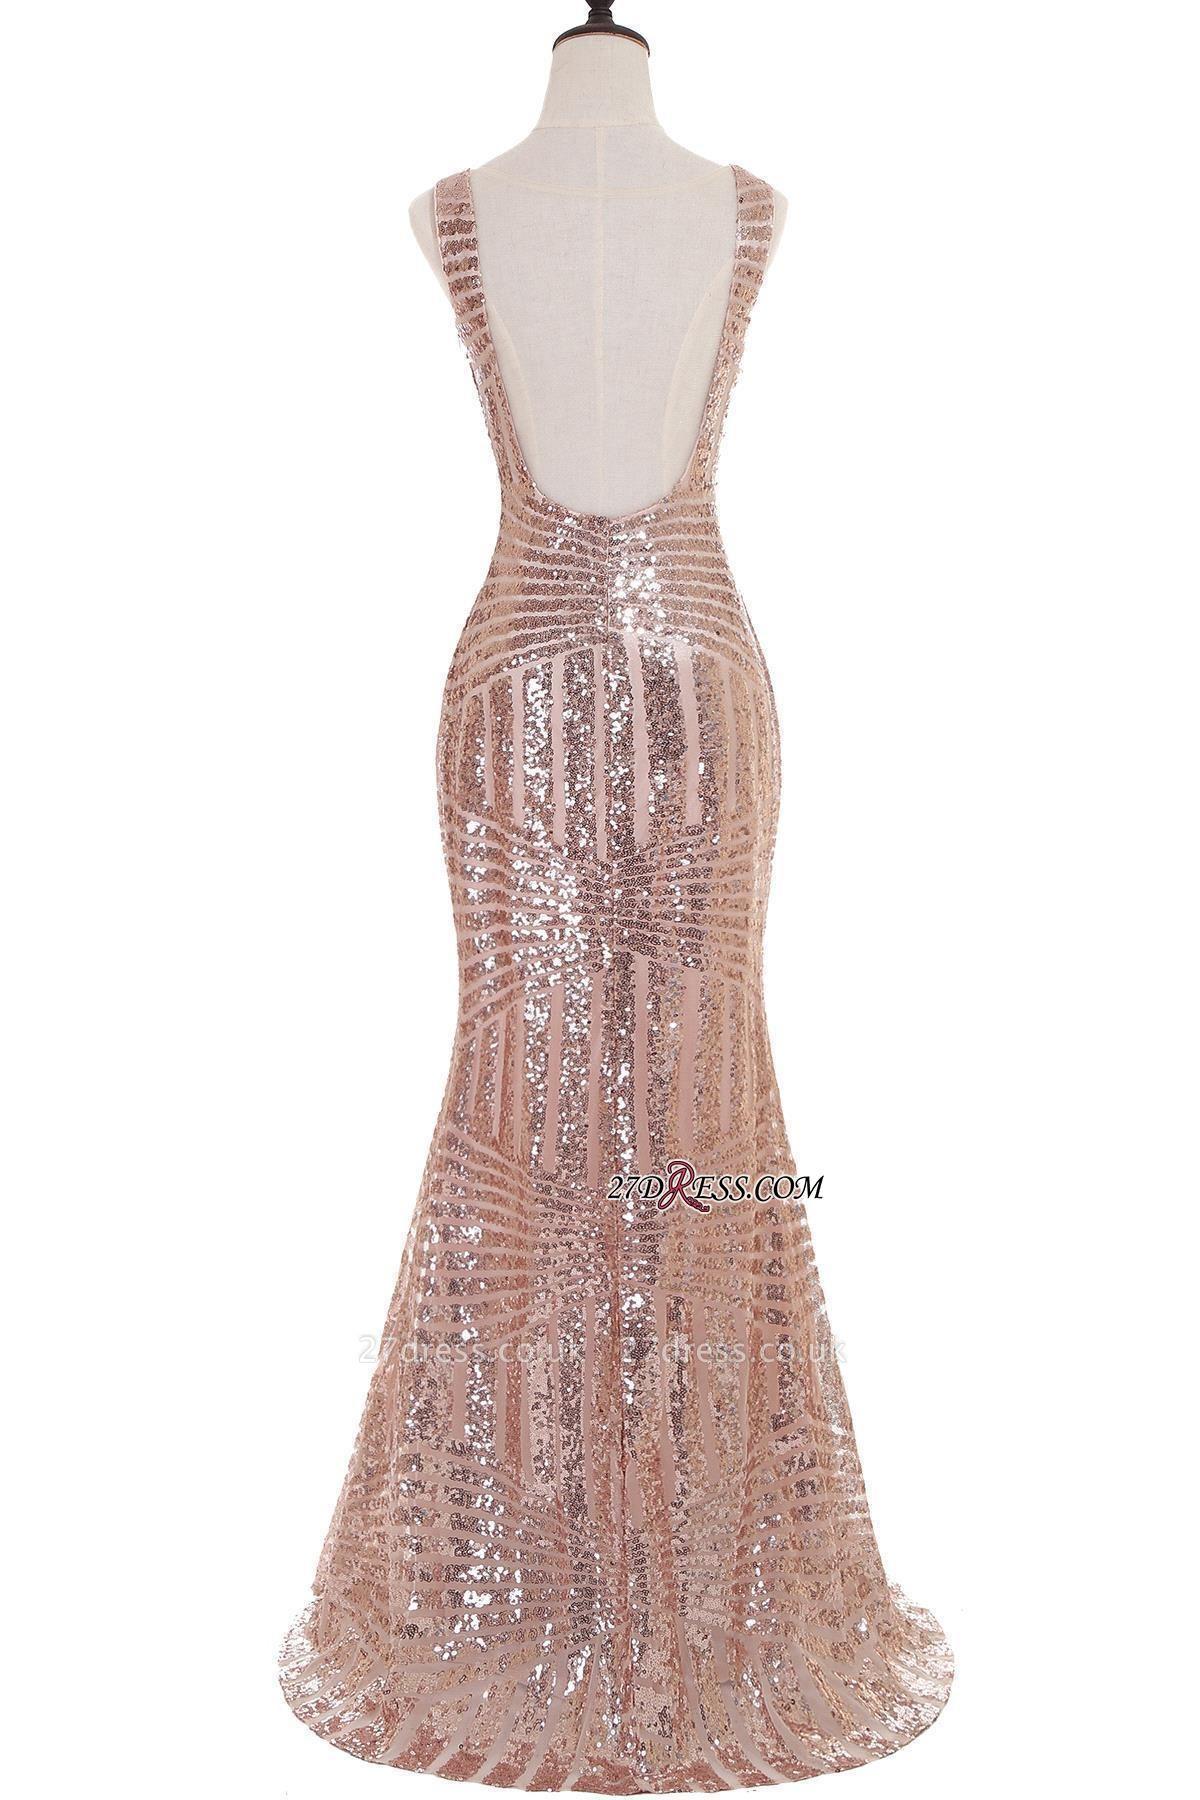 Sleeveless Newest Long Jewel Sequin Mermaid Prom Dress UK